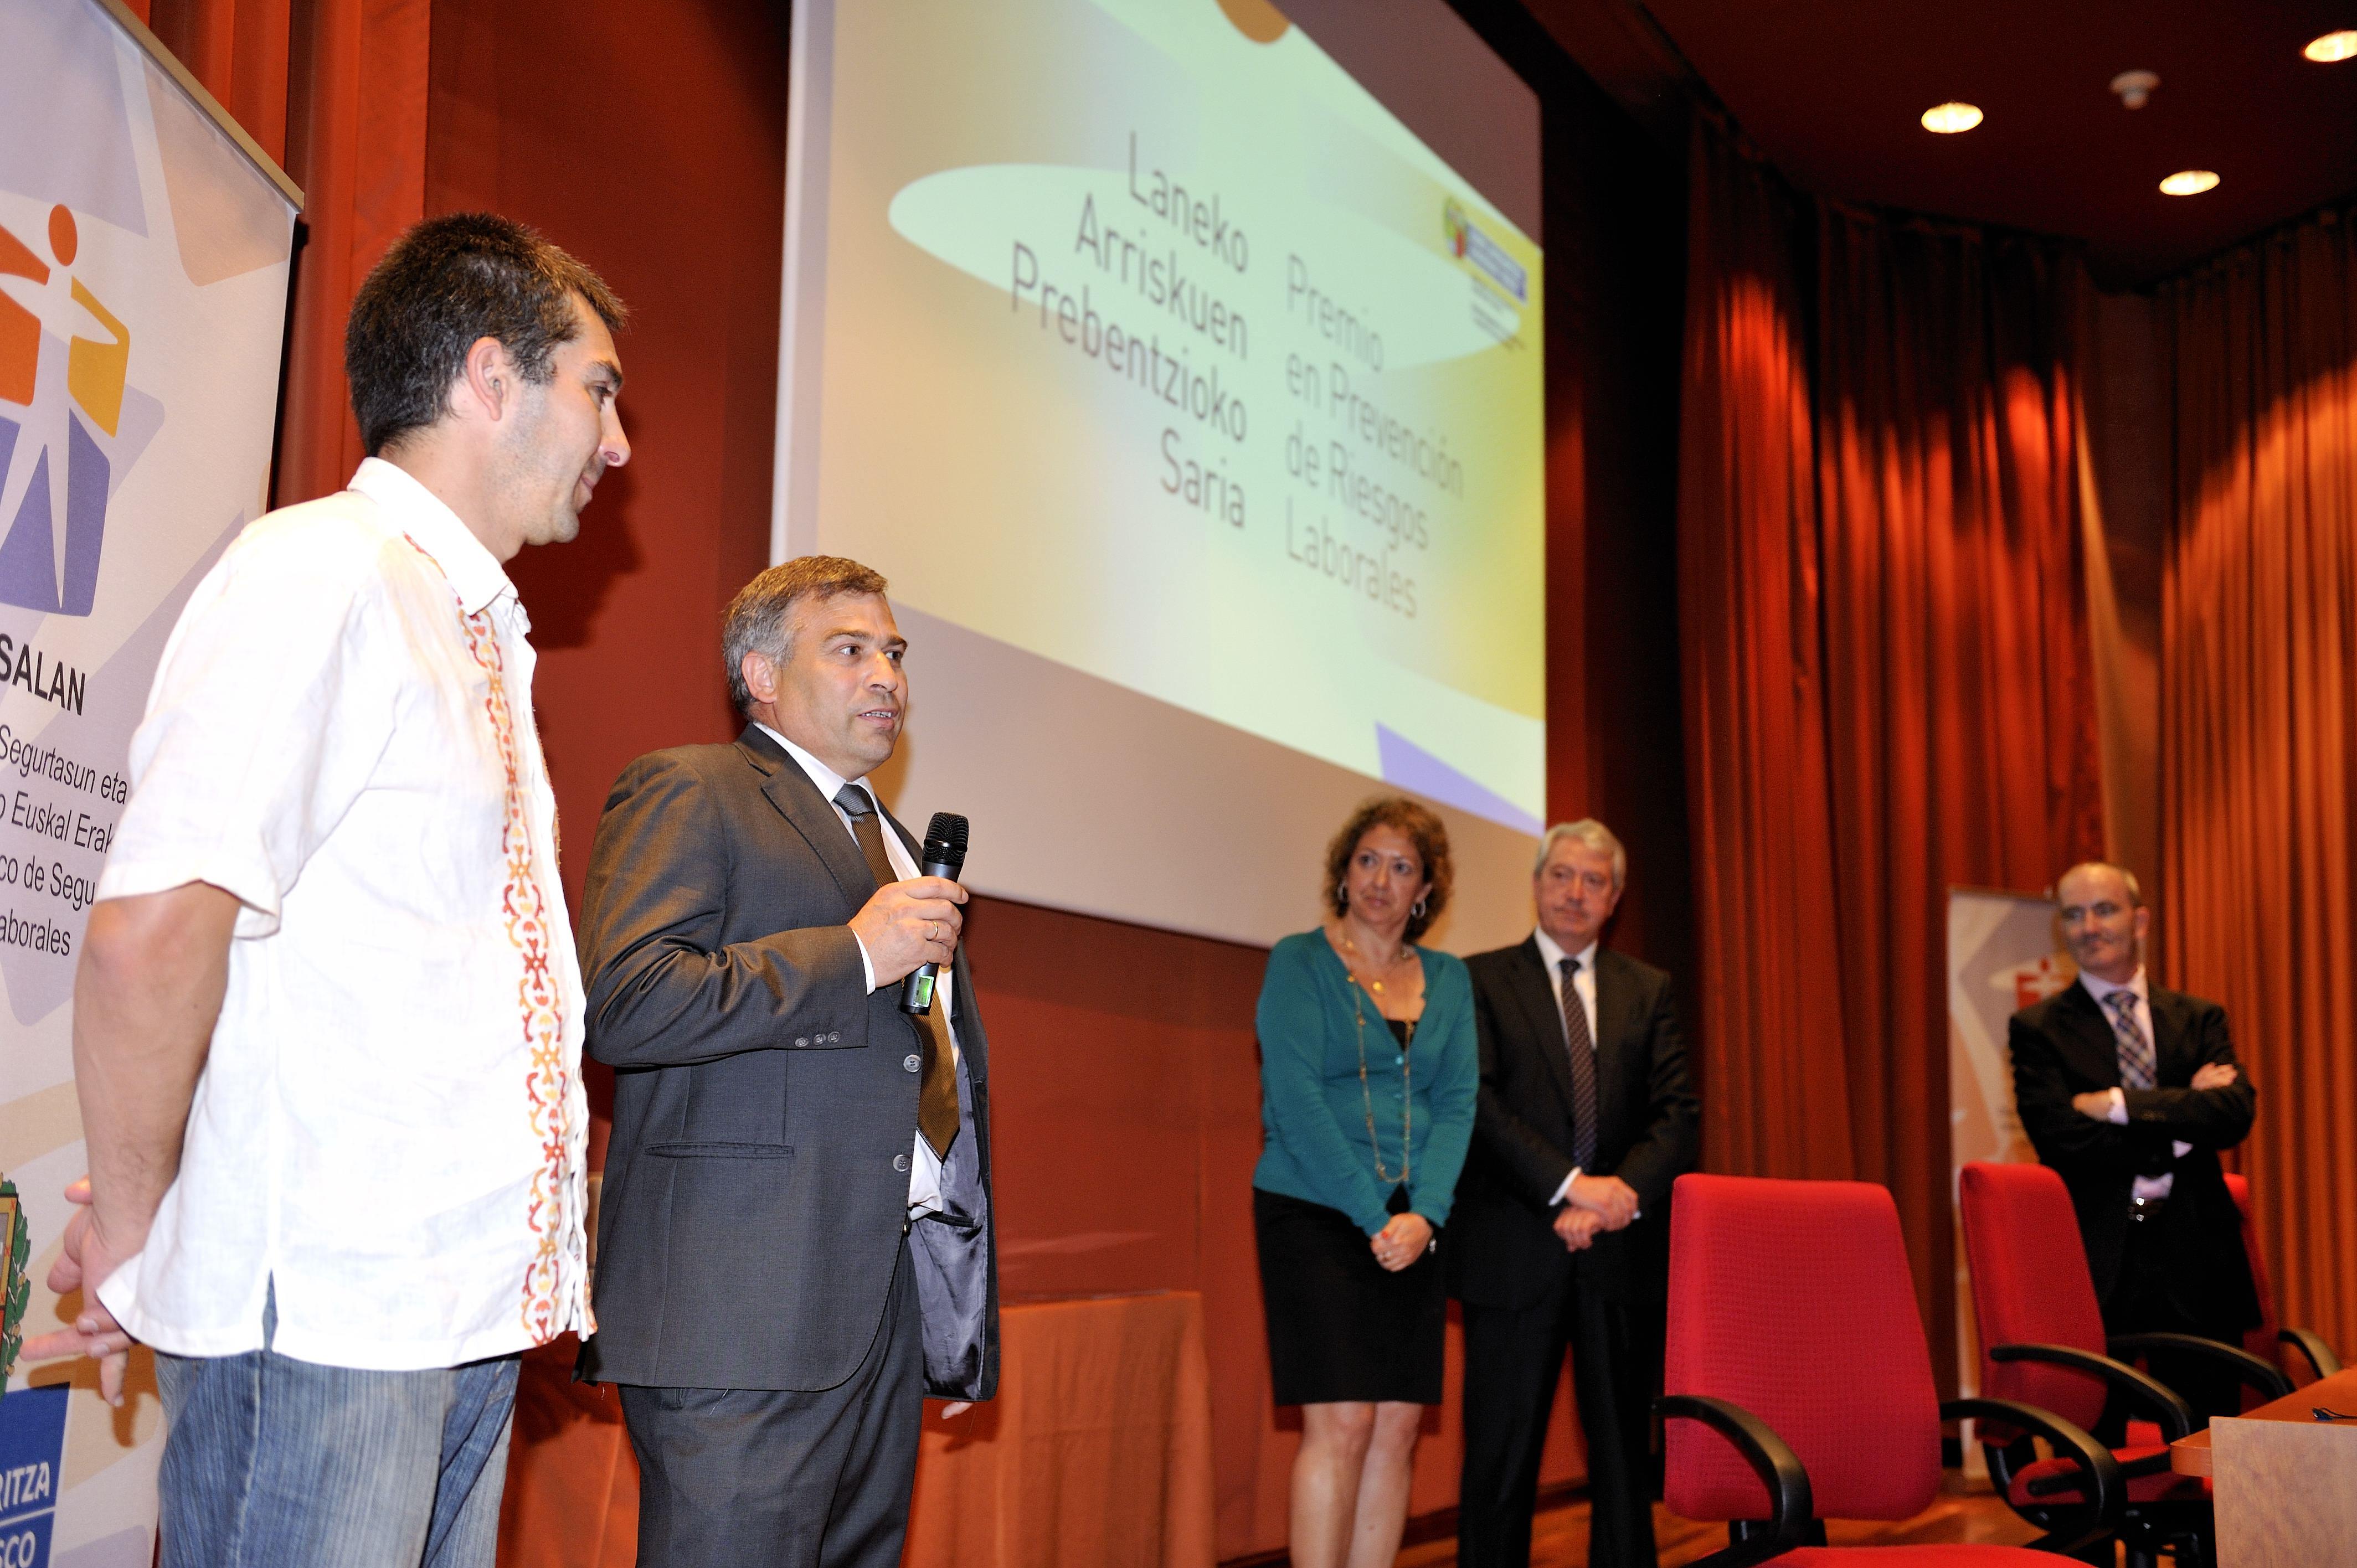 premios_osalan4.jpg